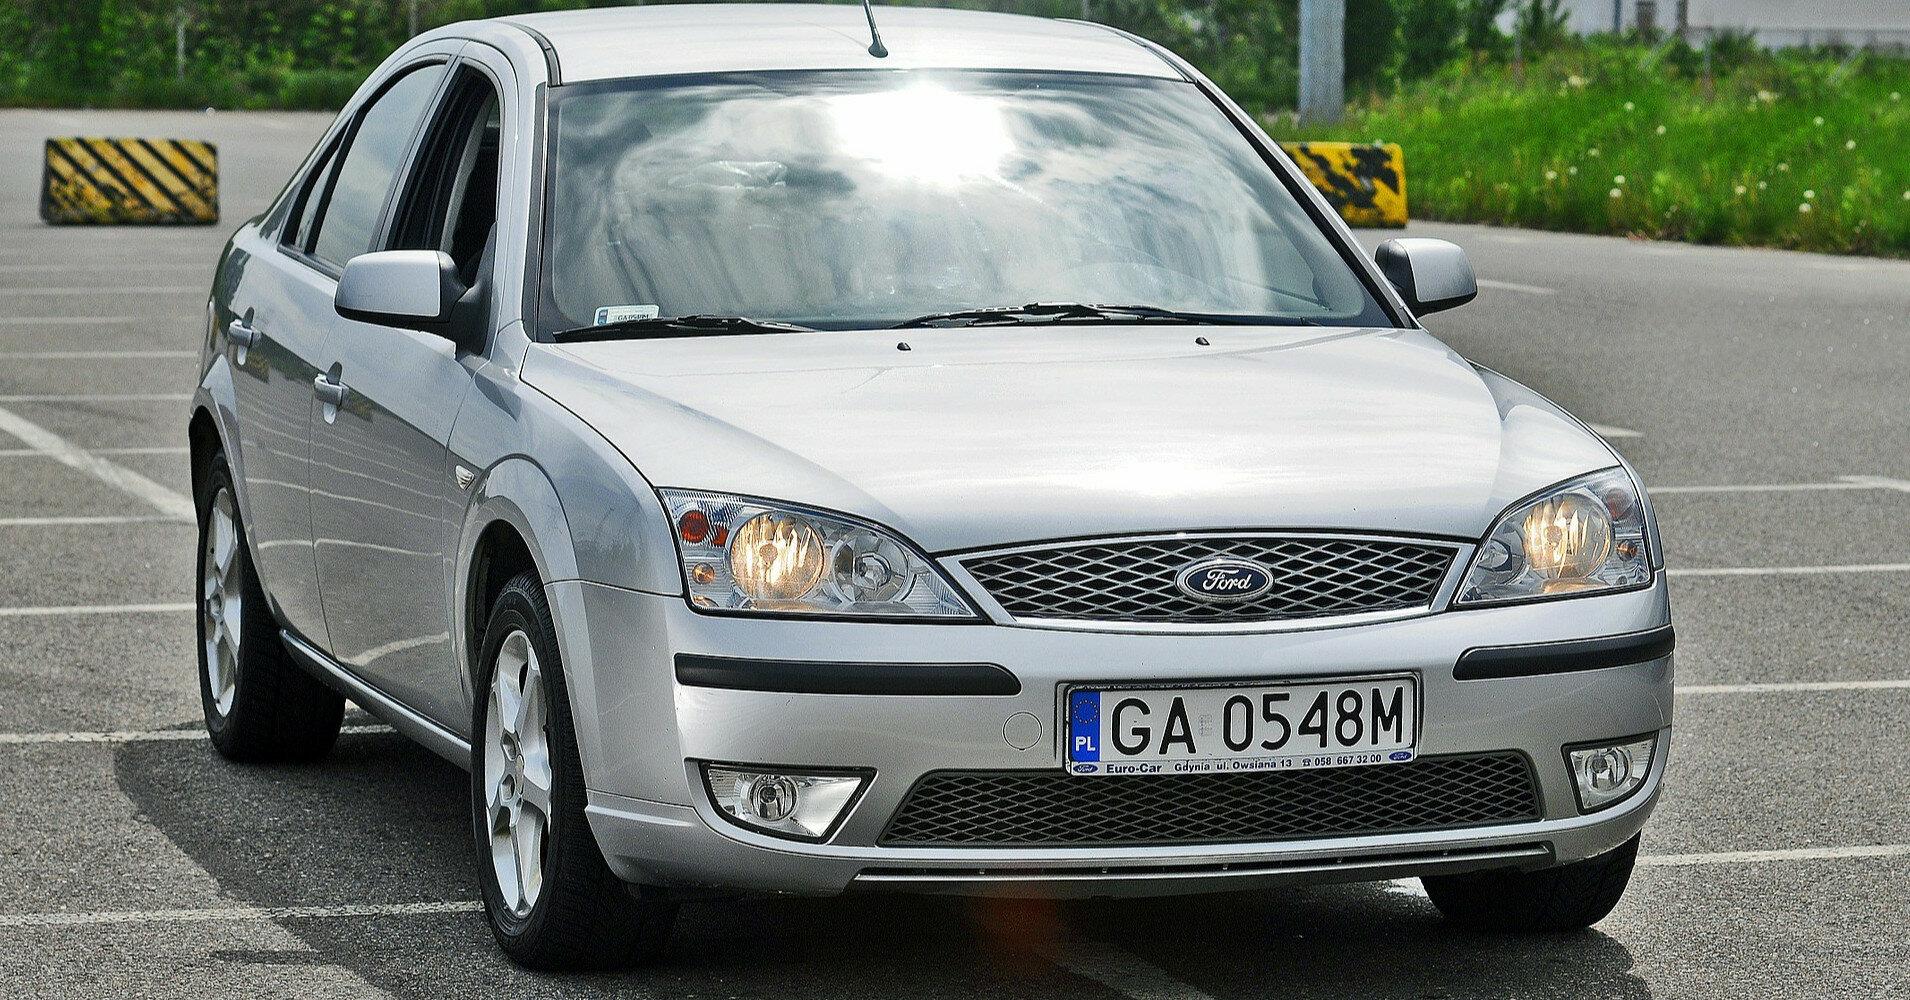 В каких странах можно дистанционно снять авто с учета